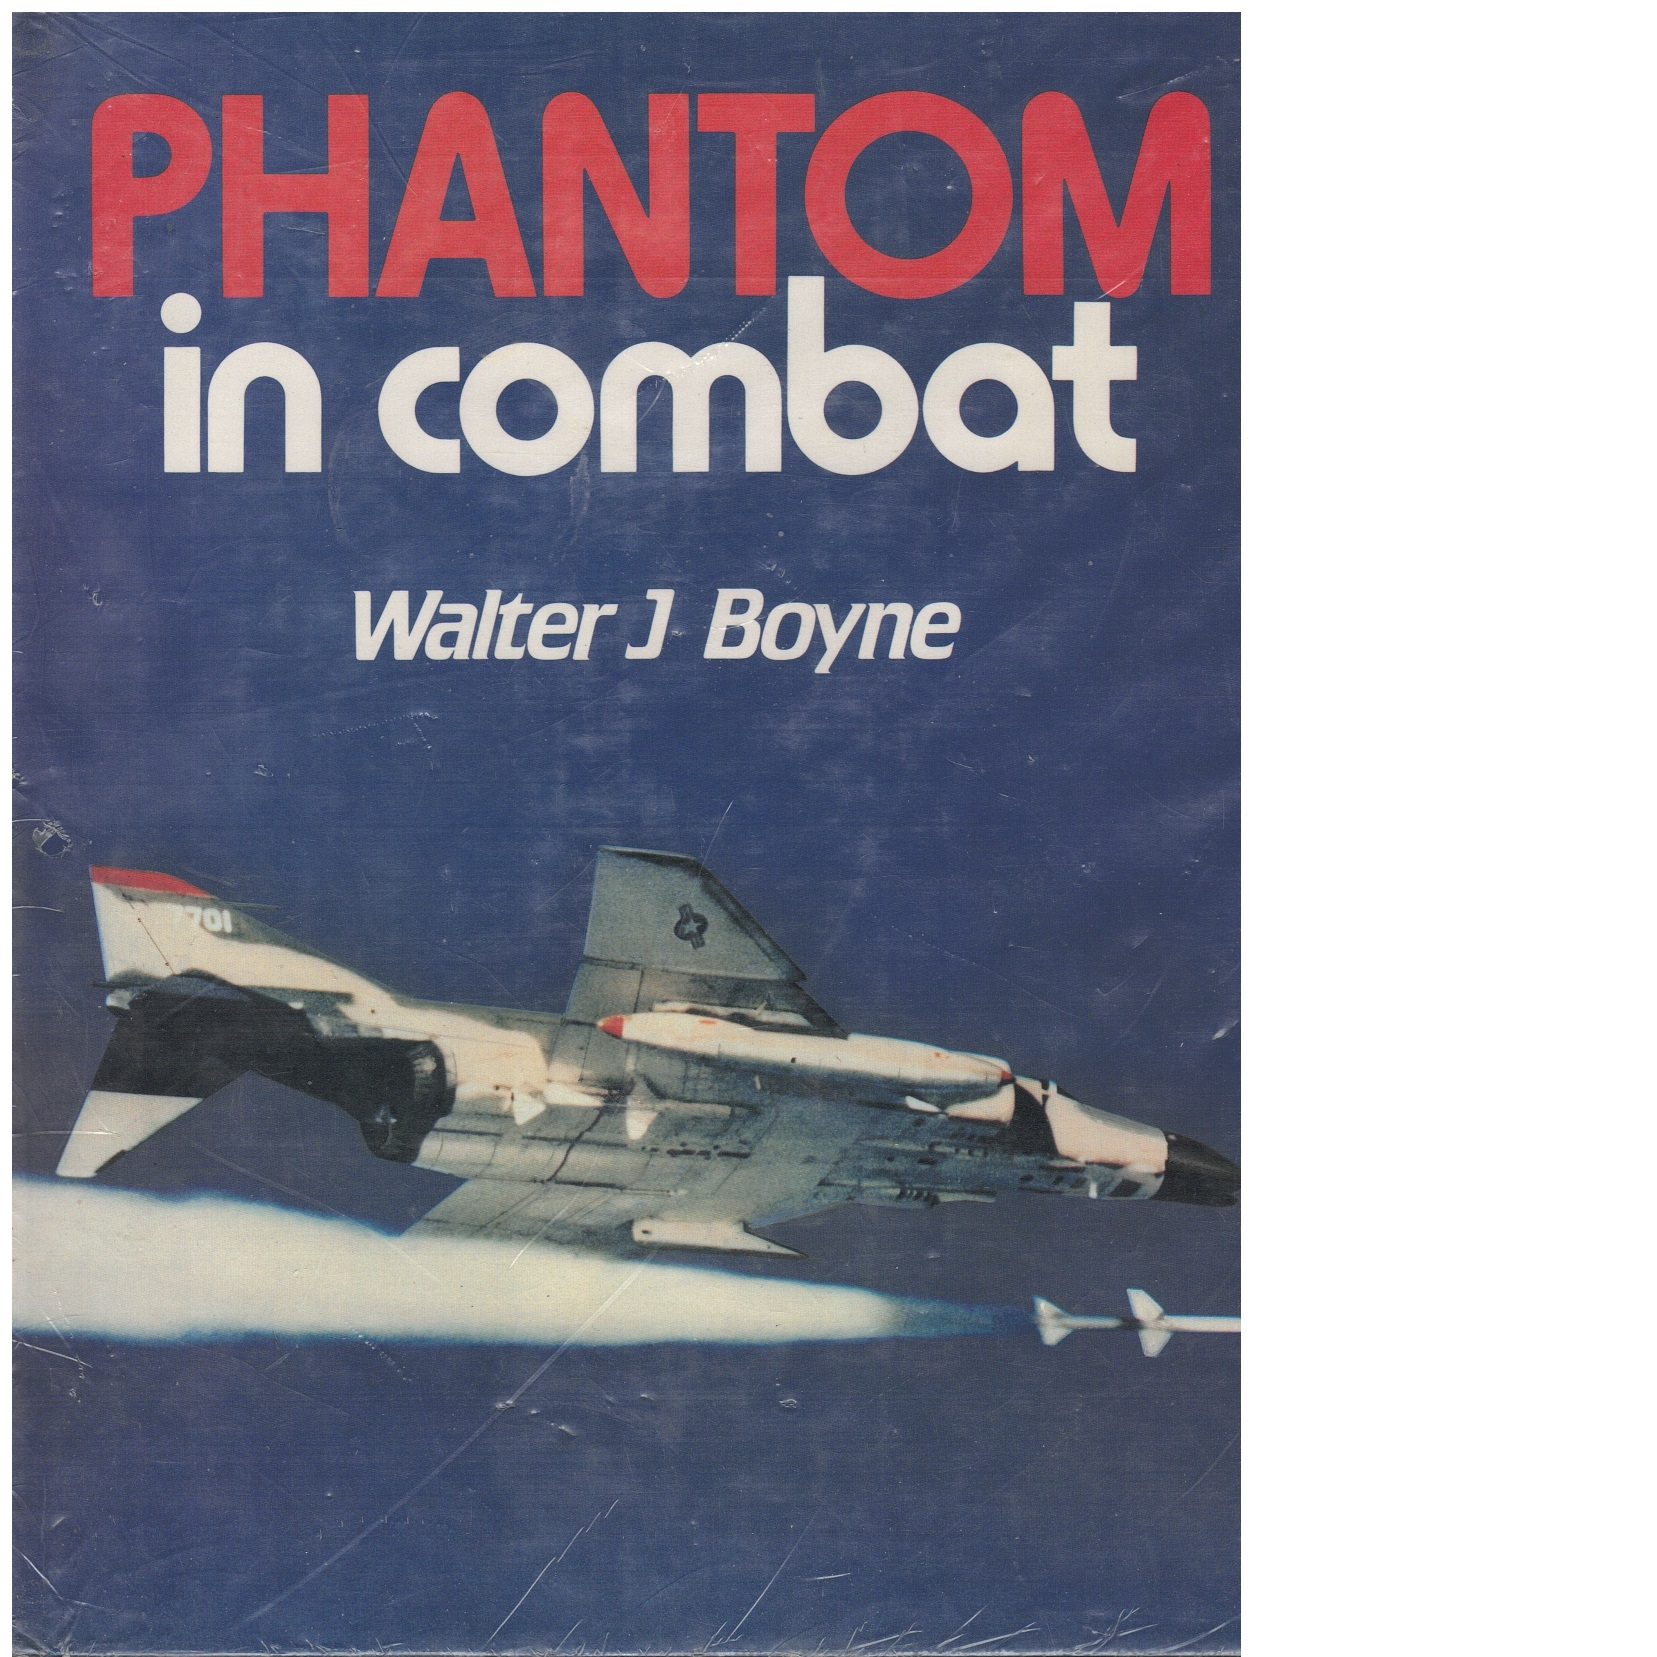 Phantom in combat - Boyne, Walter J.